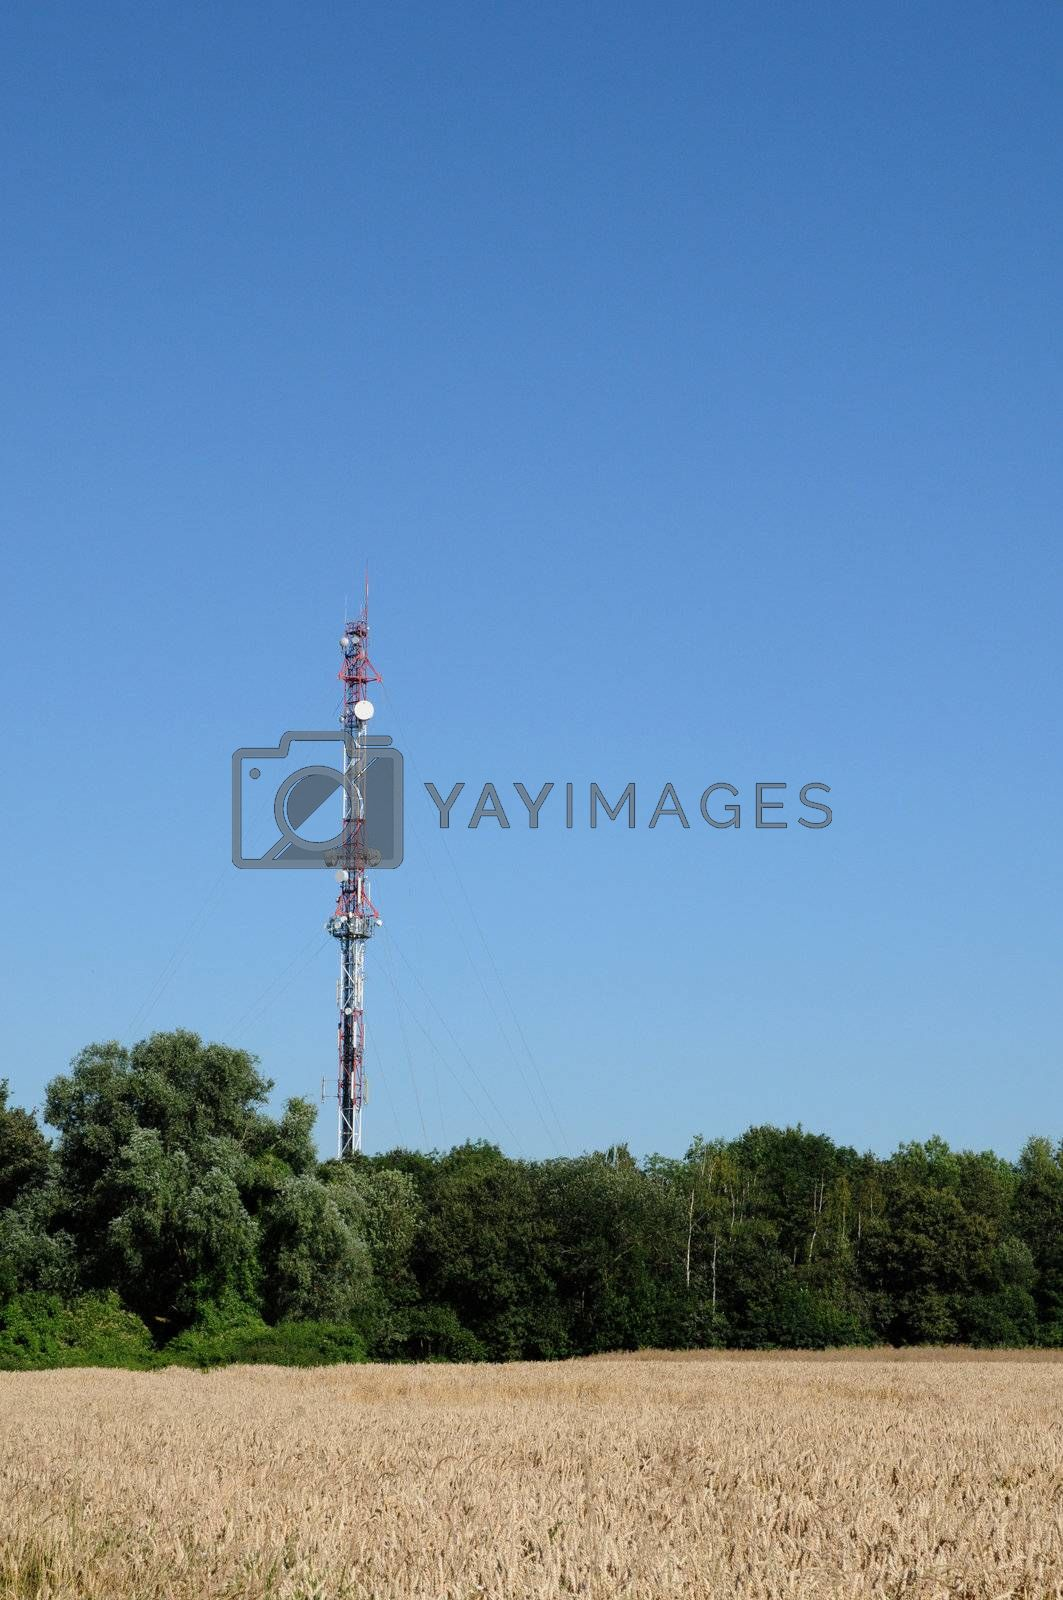 France, antennas on a pylon in les Alluets le Roi